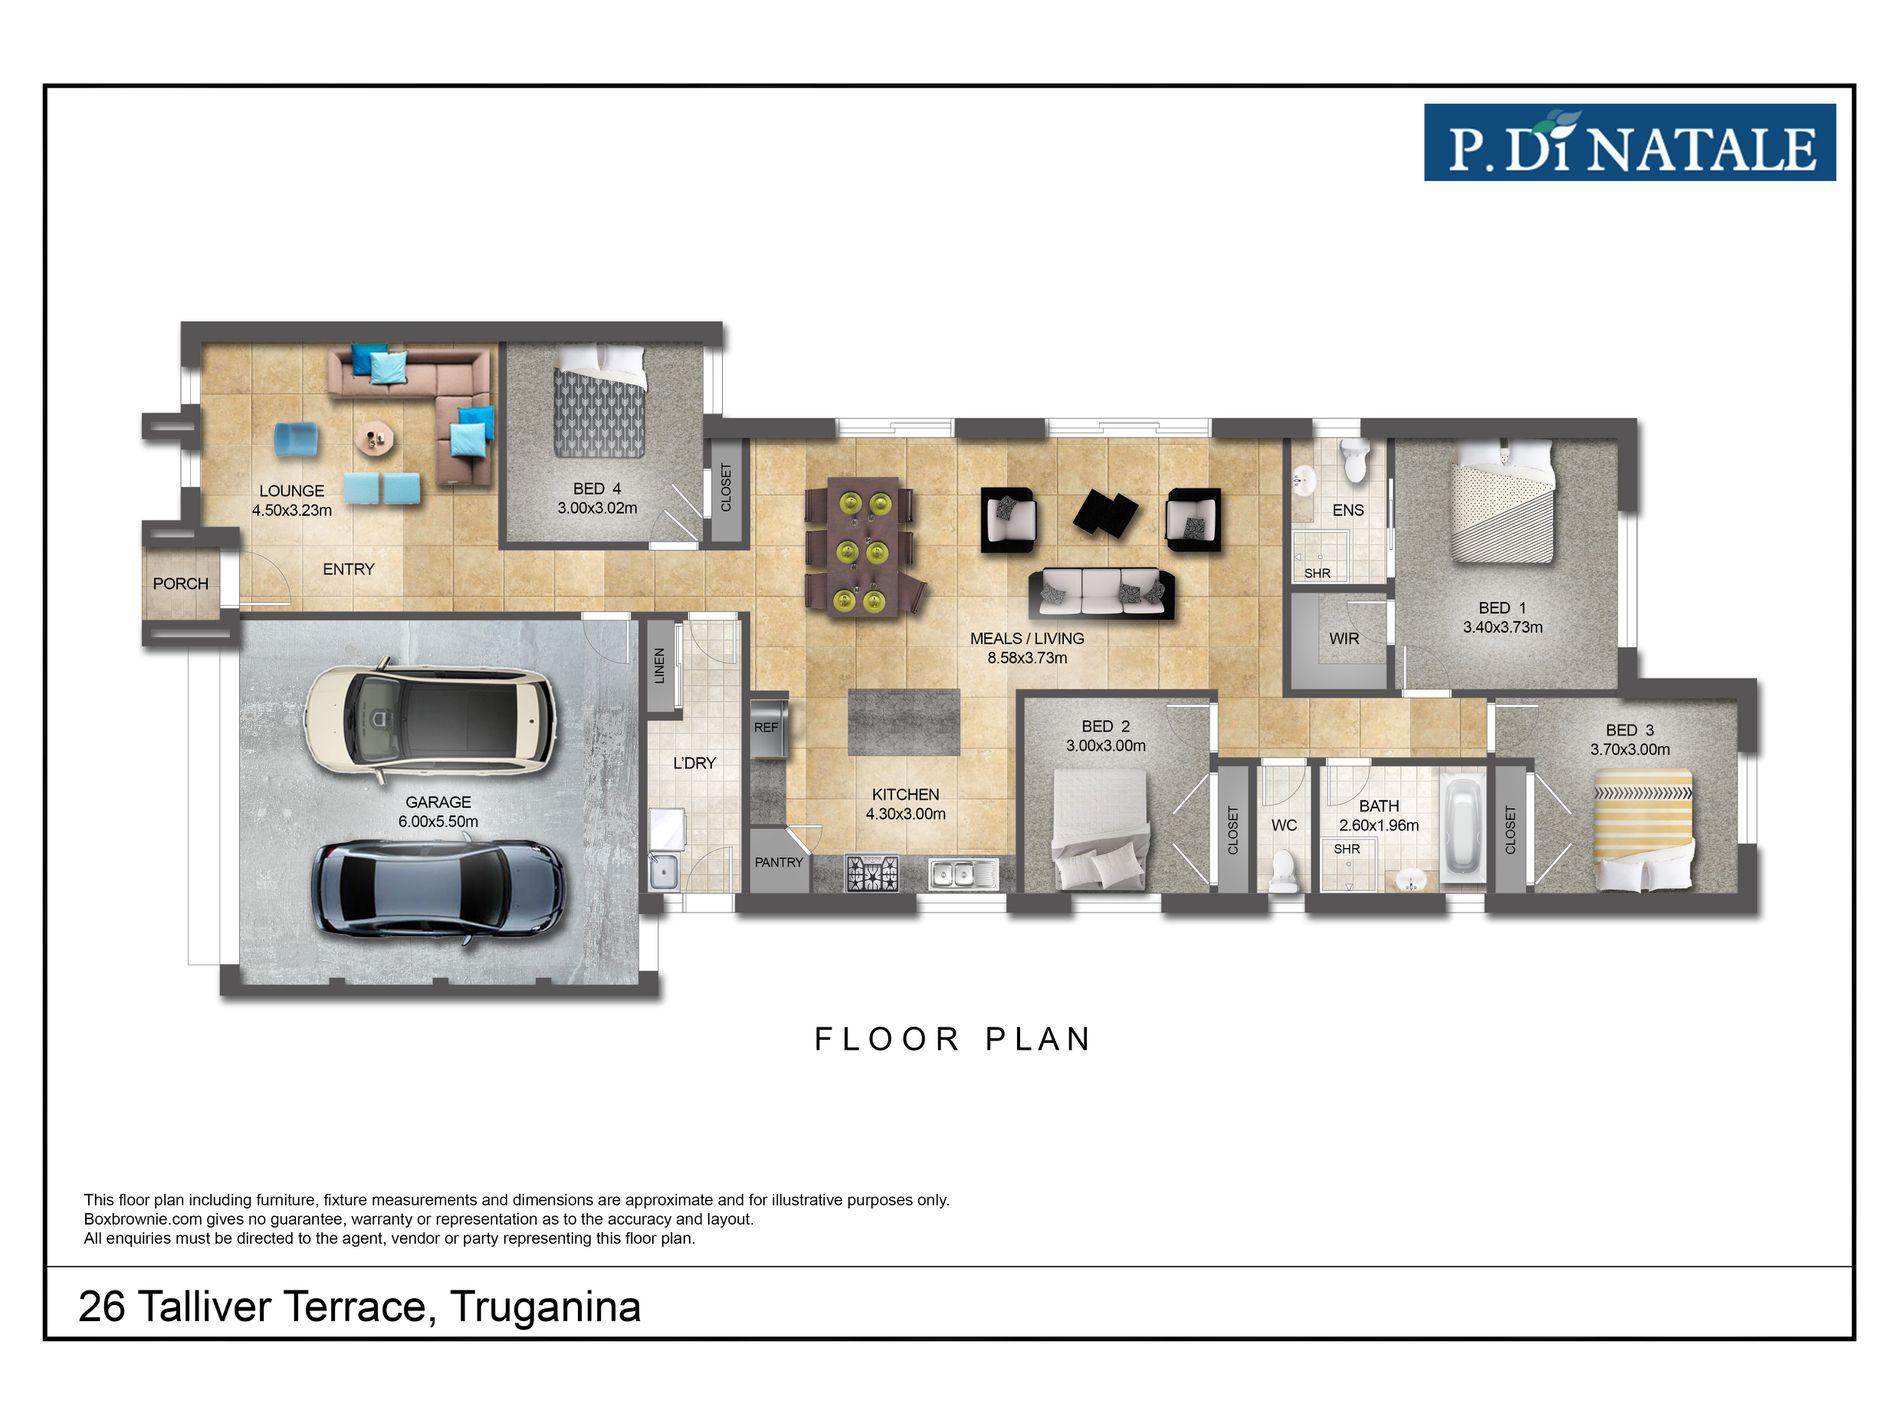 26 Talliver Terrace, Truganina